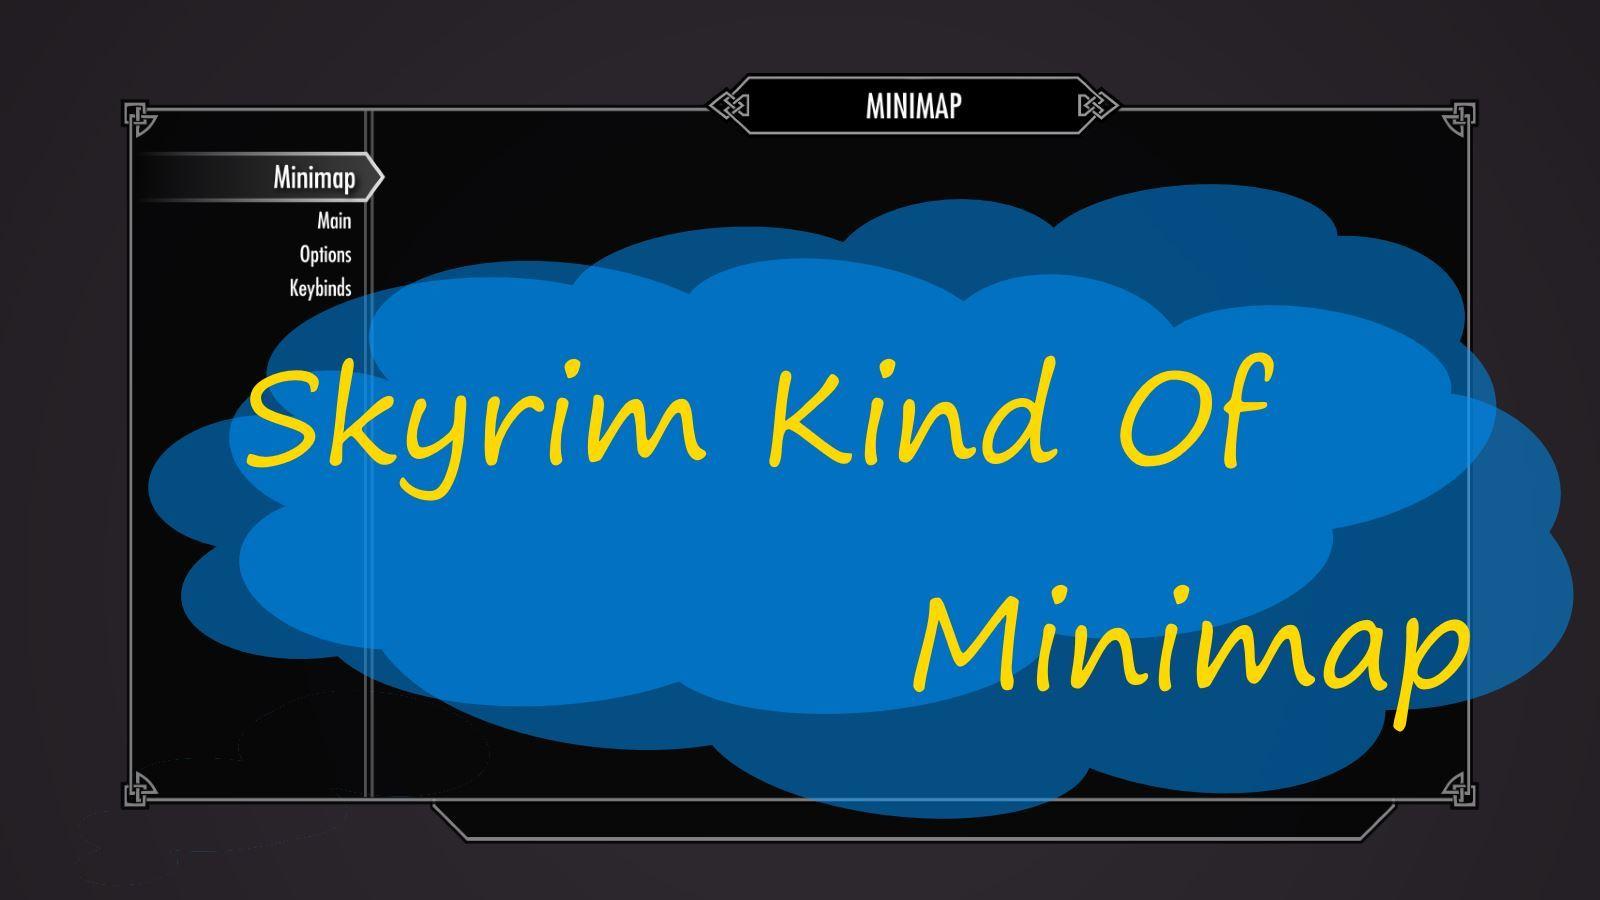 SkyrimMinimapSK 000-1 Thumbnail 1